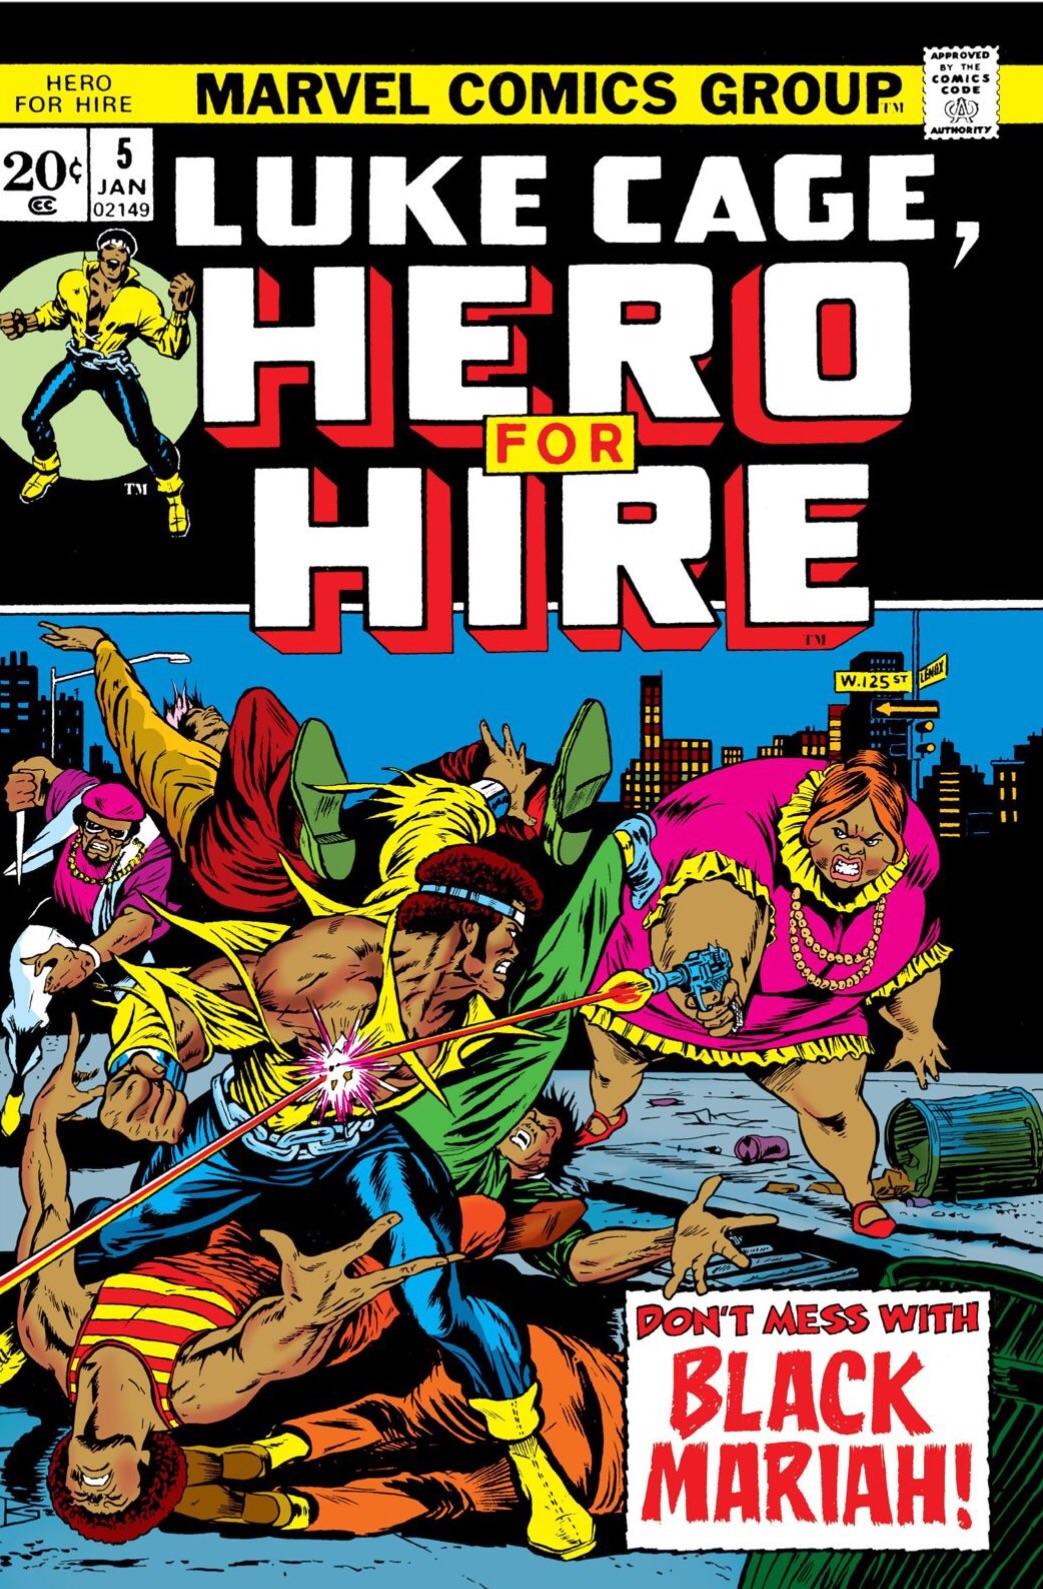 Hero for hire.jpg